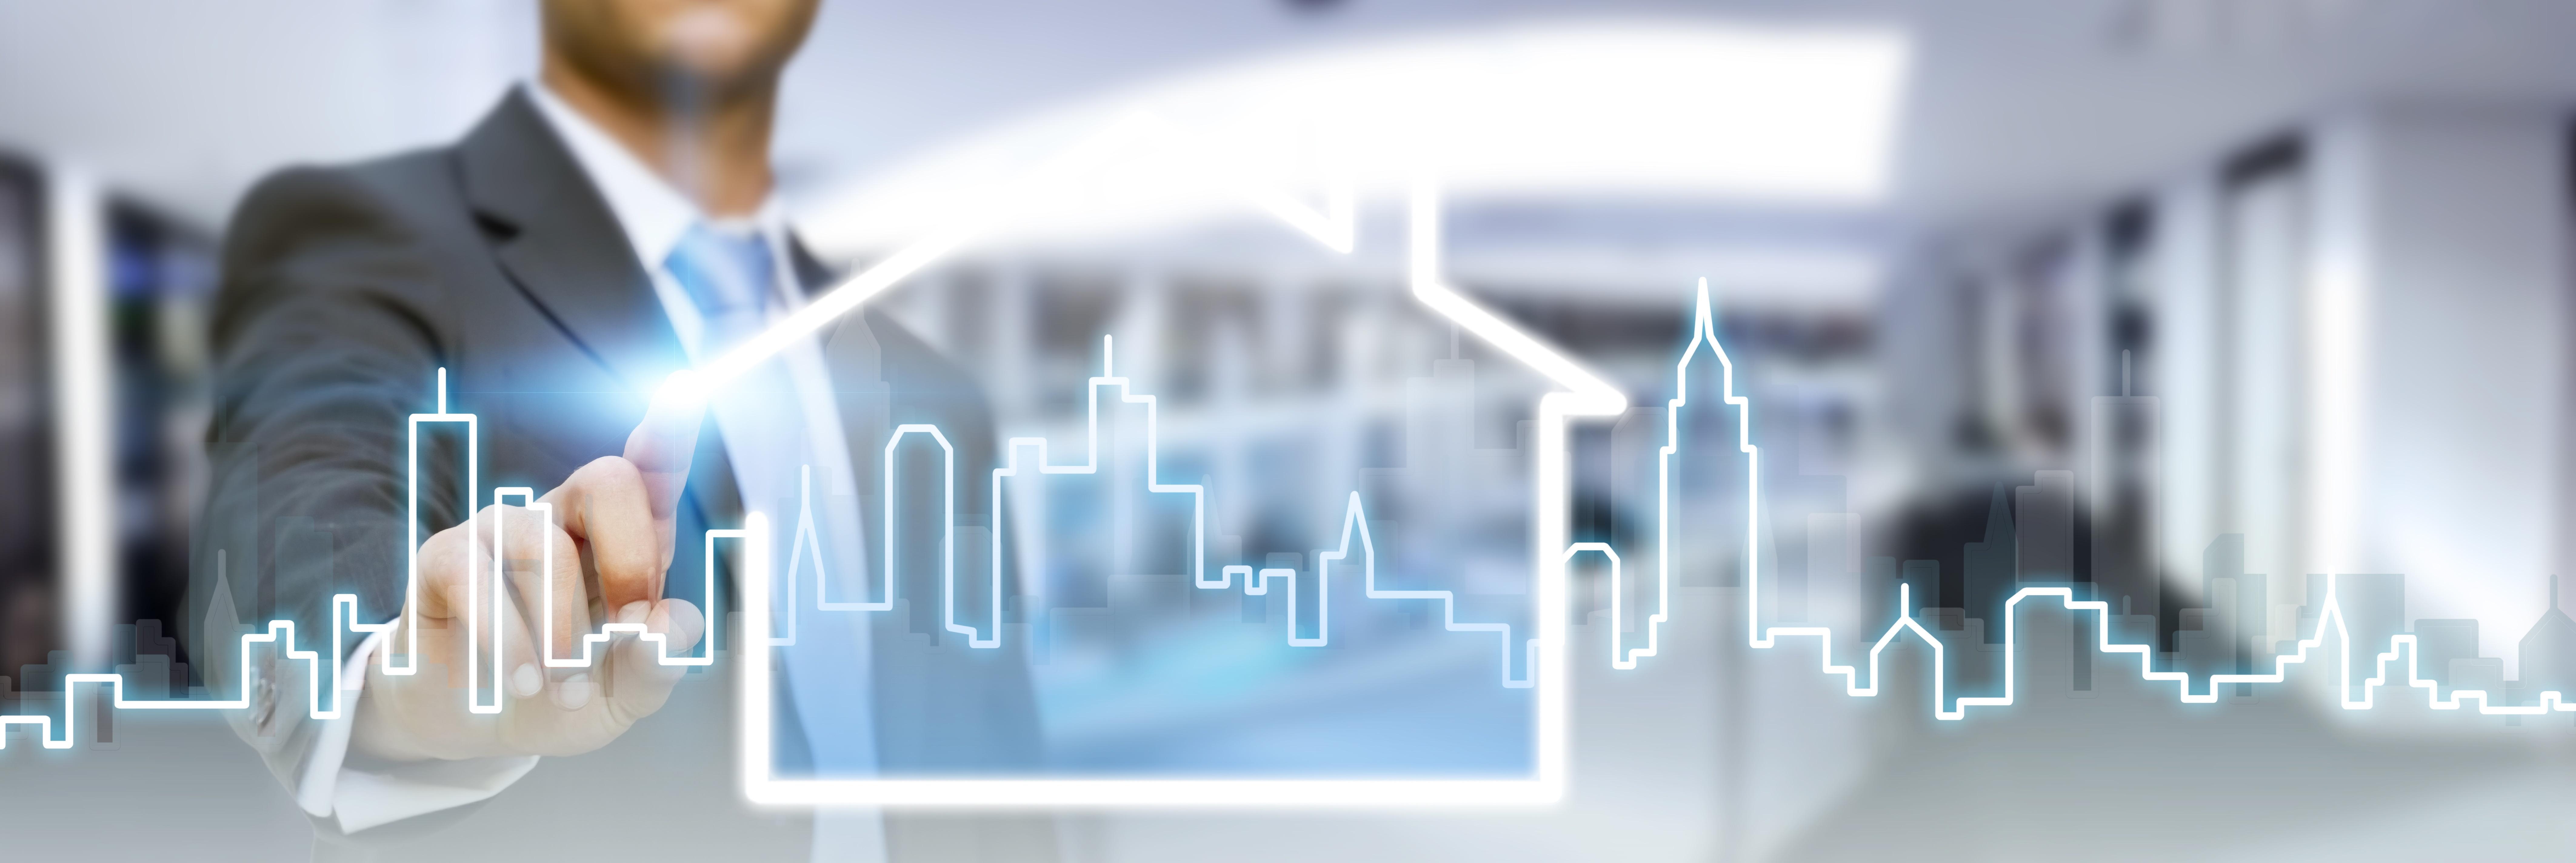 Dr. Glenn Mueller's 2Q Real Estate Cycle Monitor